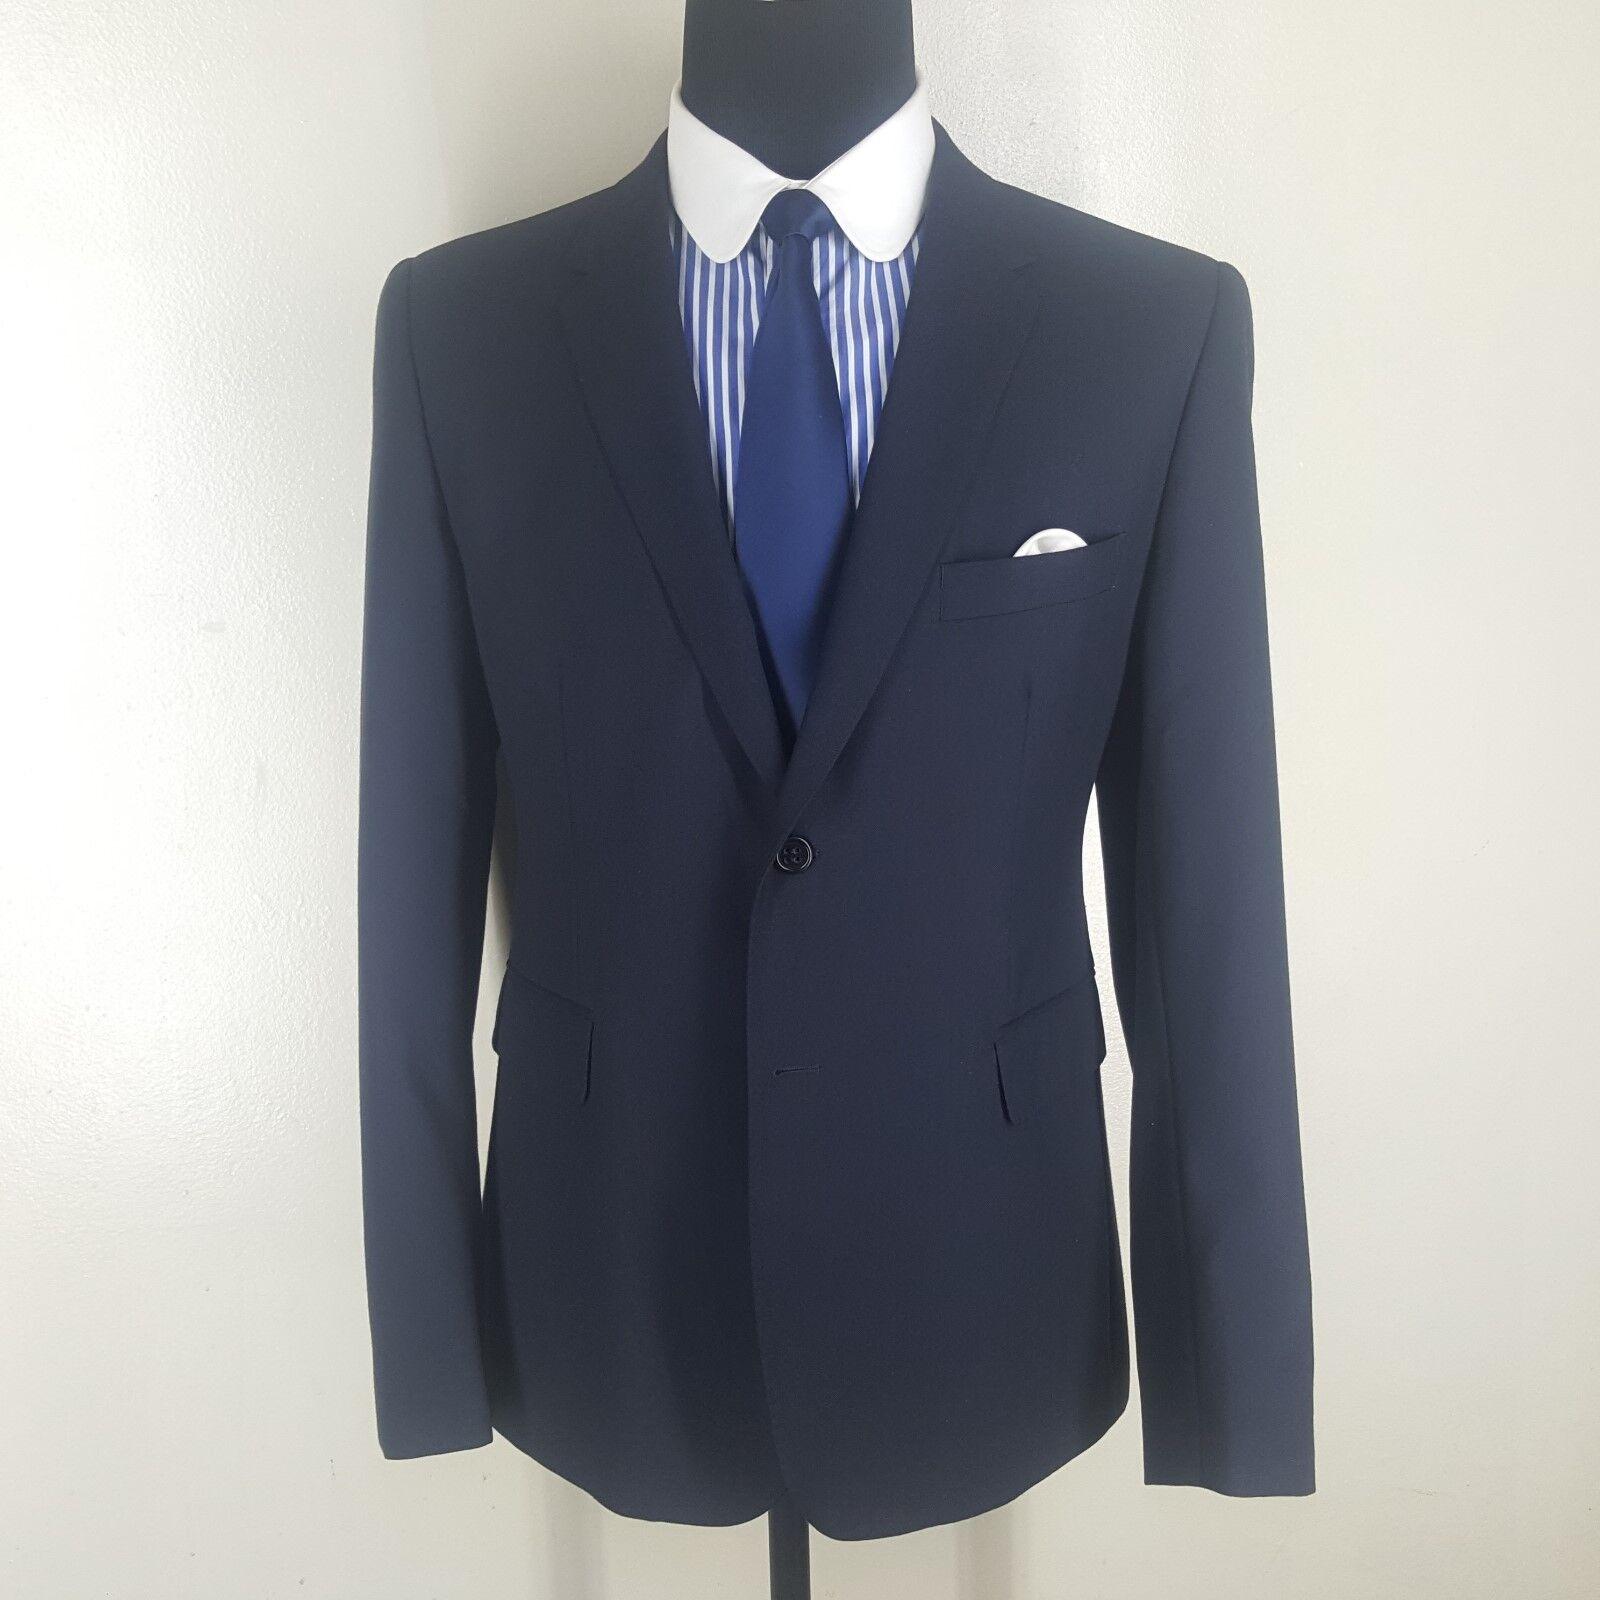 SHIPLEY & HALMOS Recent bluee Blazer 100% Wool  2 Btn Center Vent  44 R  --Mint